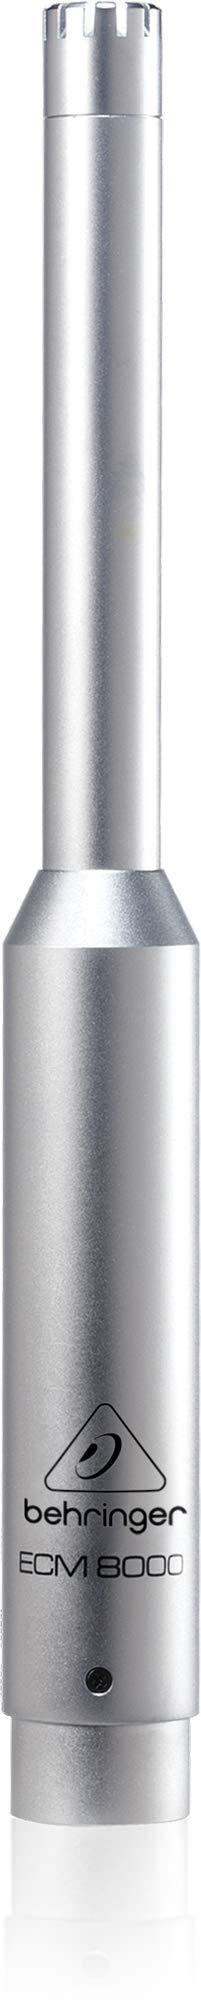 Behringer ECM8000 - Micrófono de estudio de condensador d...